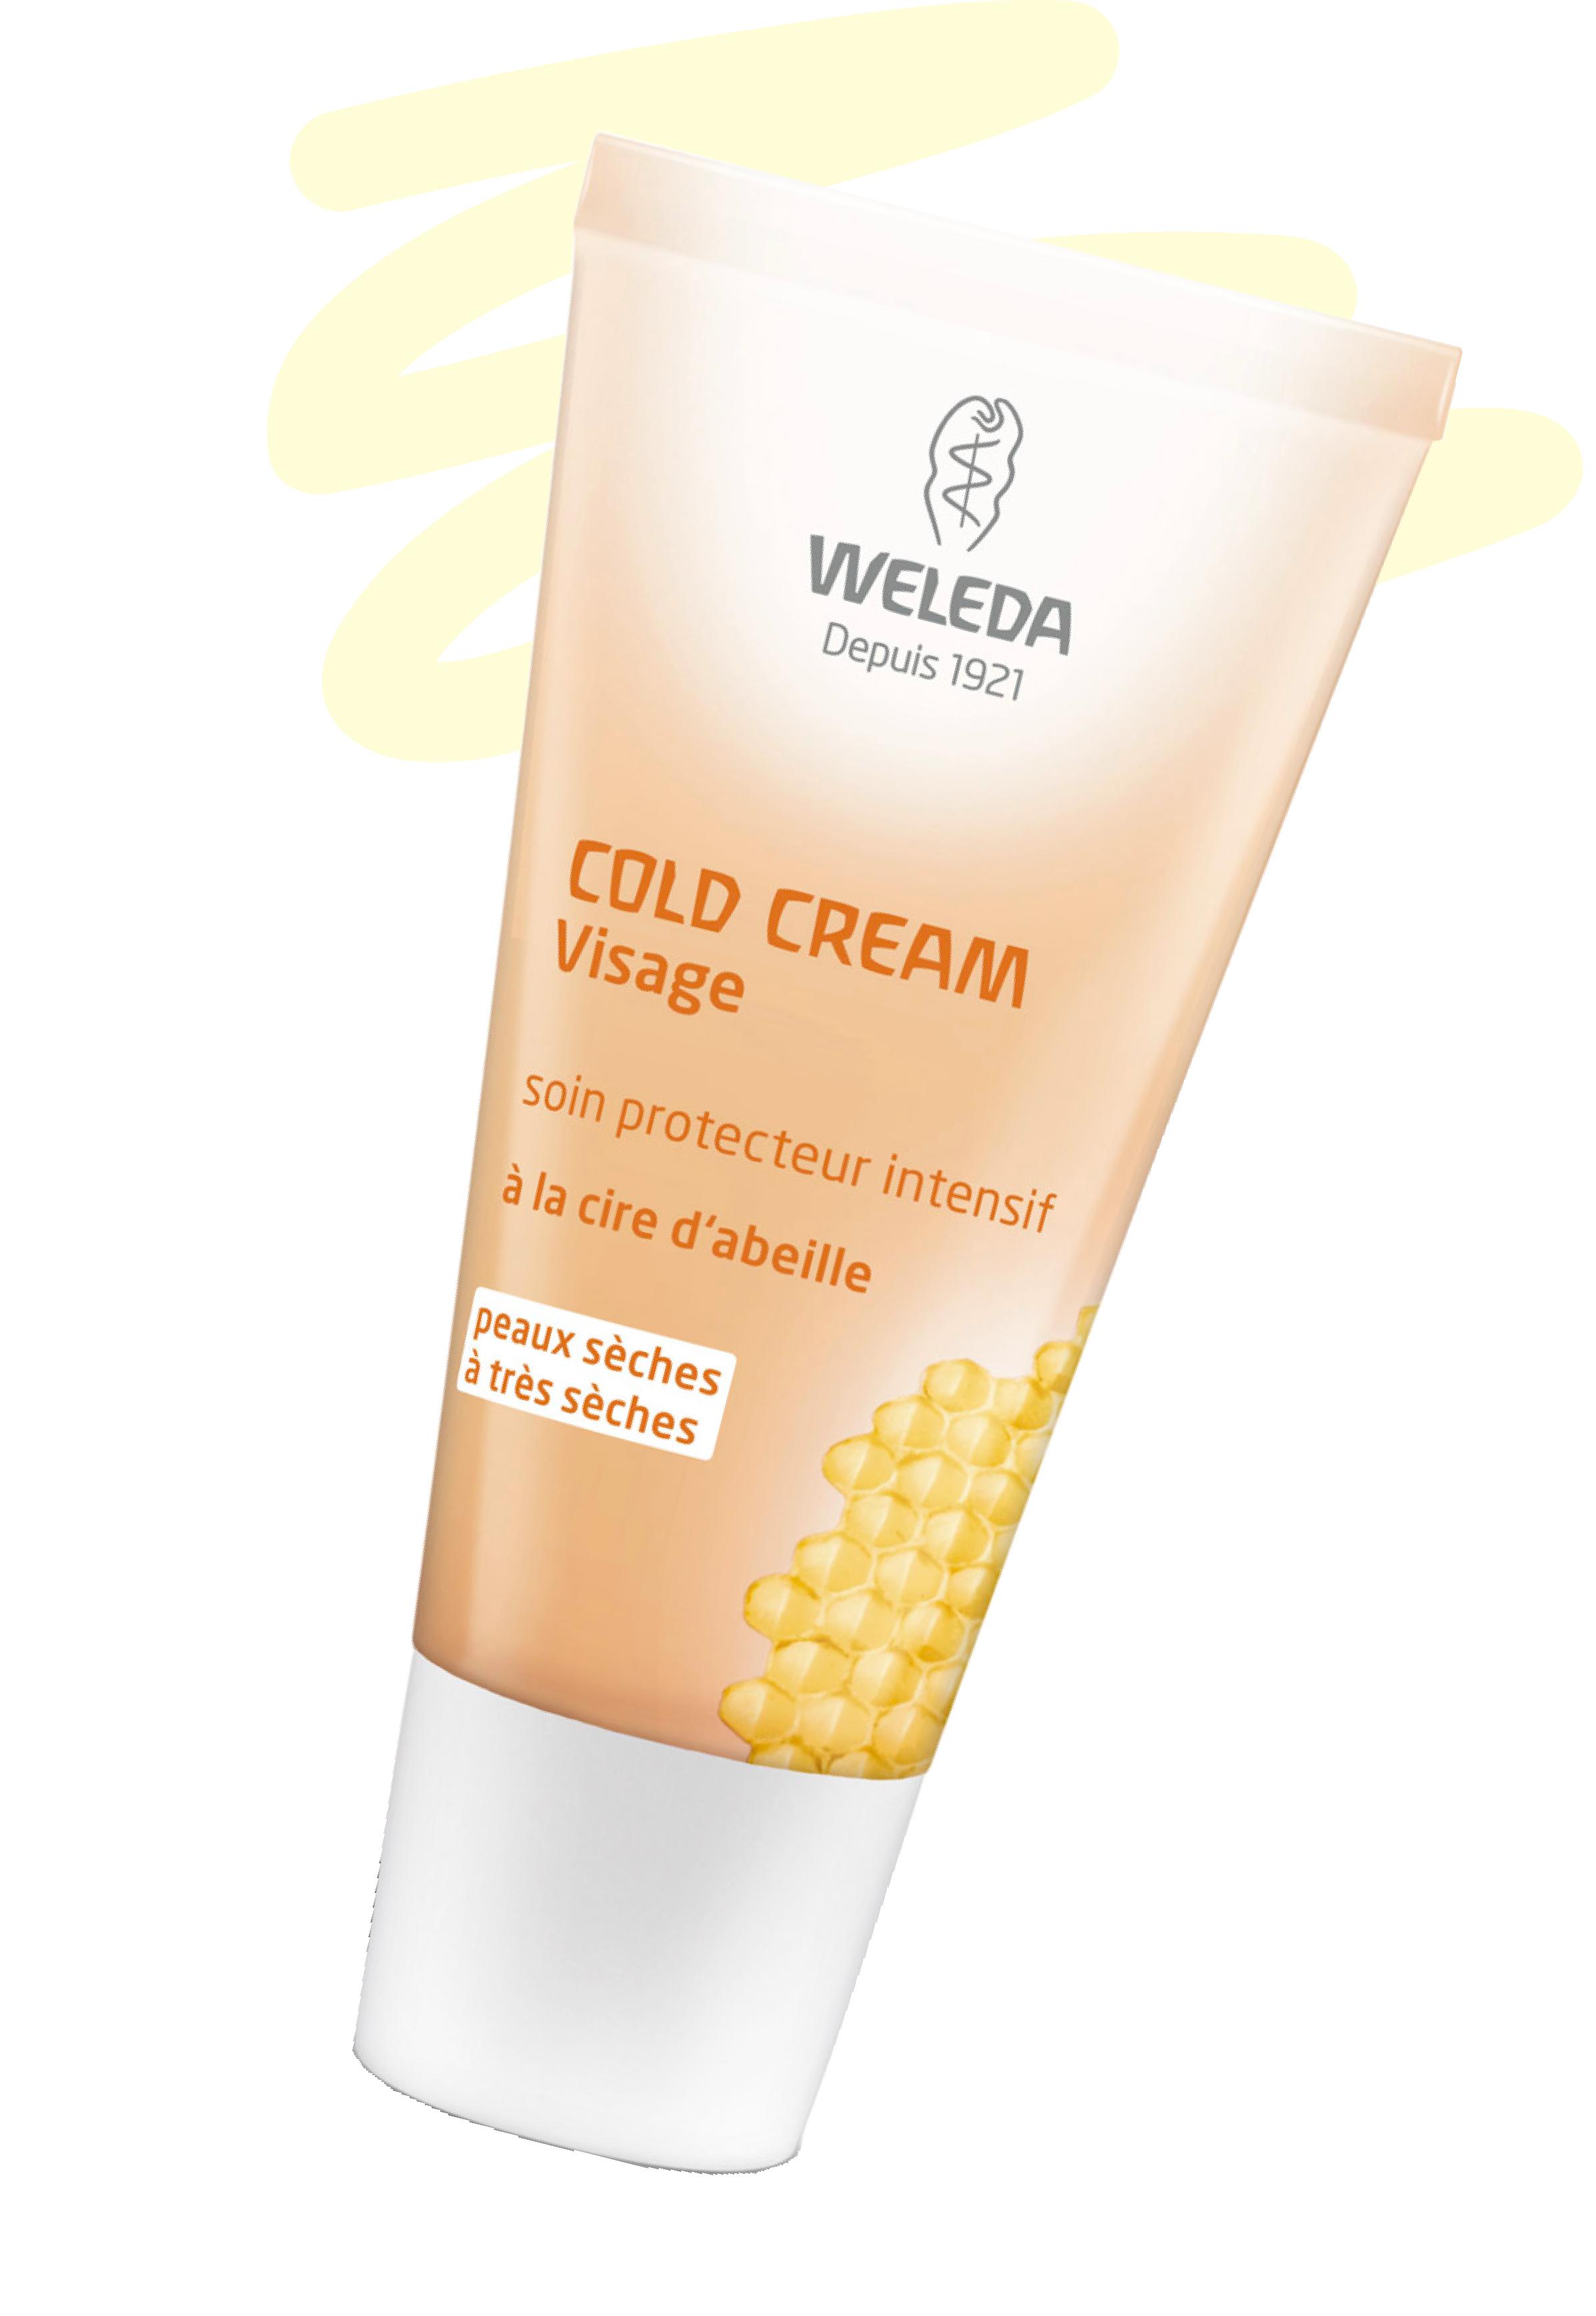 Weleda cold cream.png